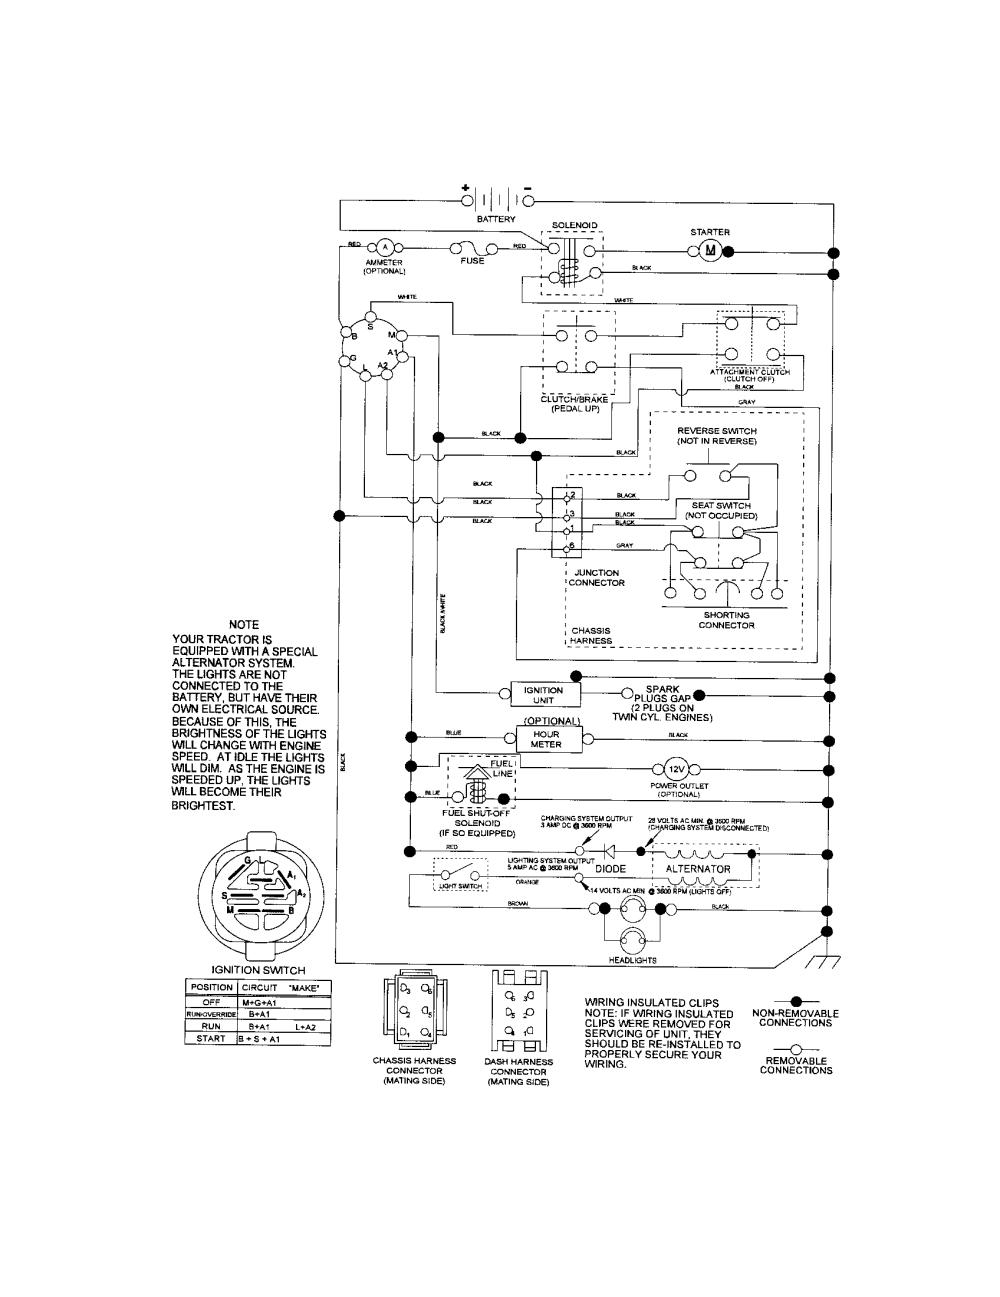 medium resolution of  p0804121 00011 case 222 tractor wiring diagrams case 222 garden tractor case 430 wiring diagram at